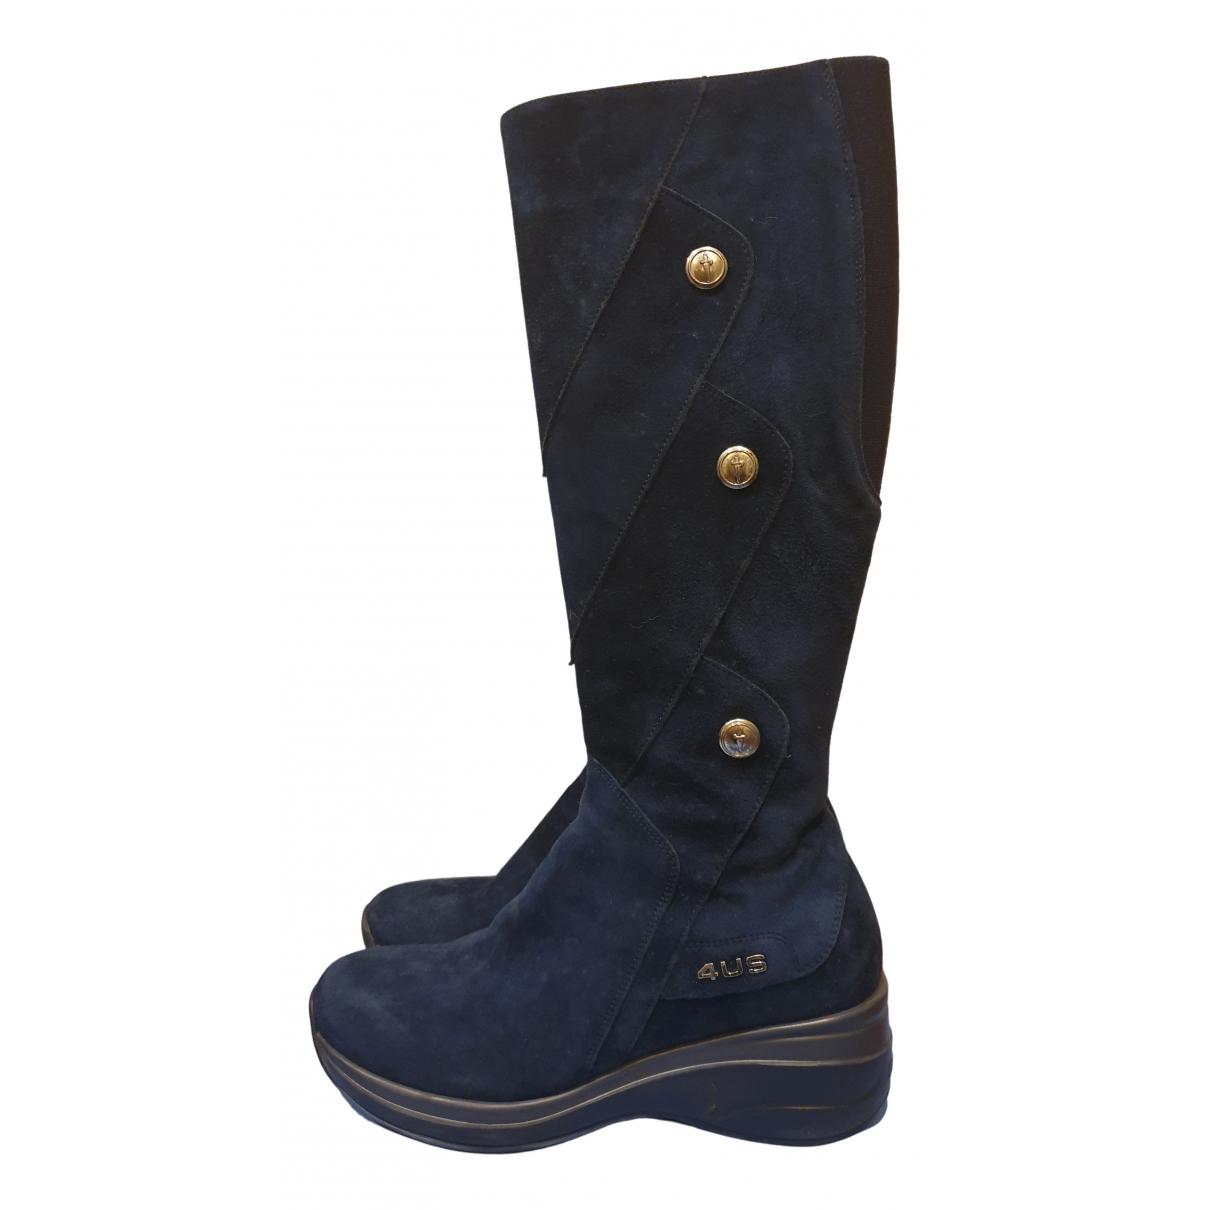 Cesare Paciotti N Blue Suede Boots for Women 38 IT